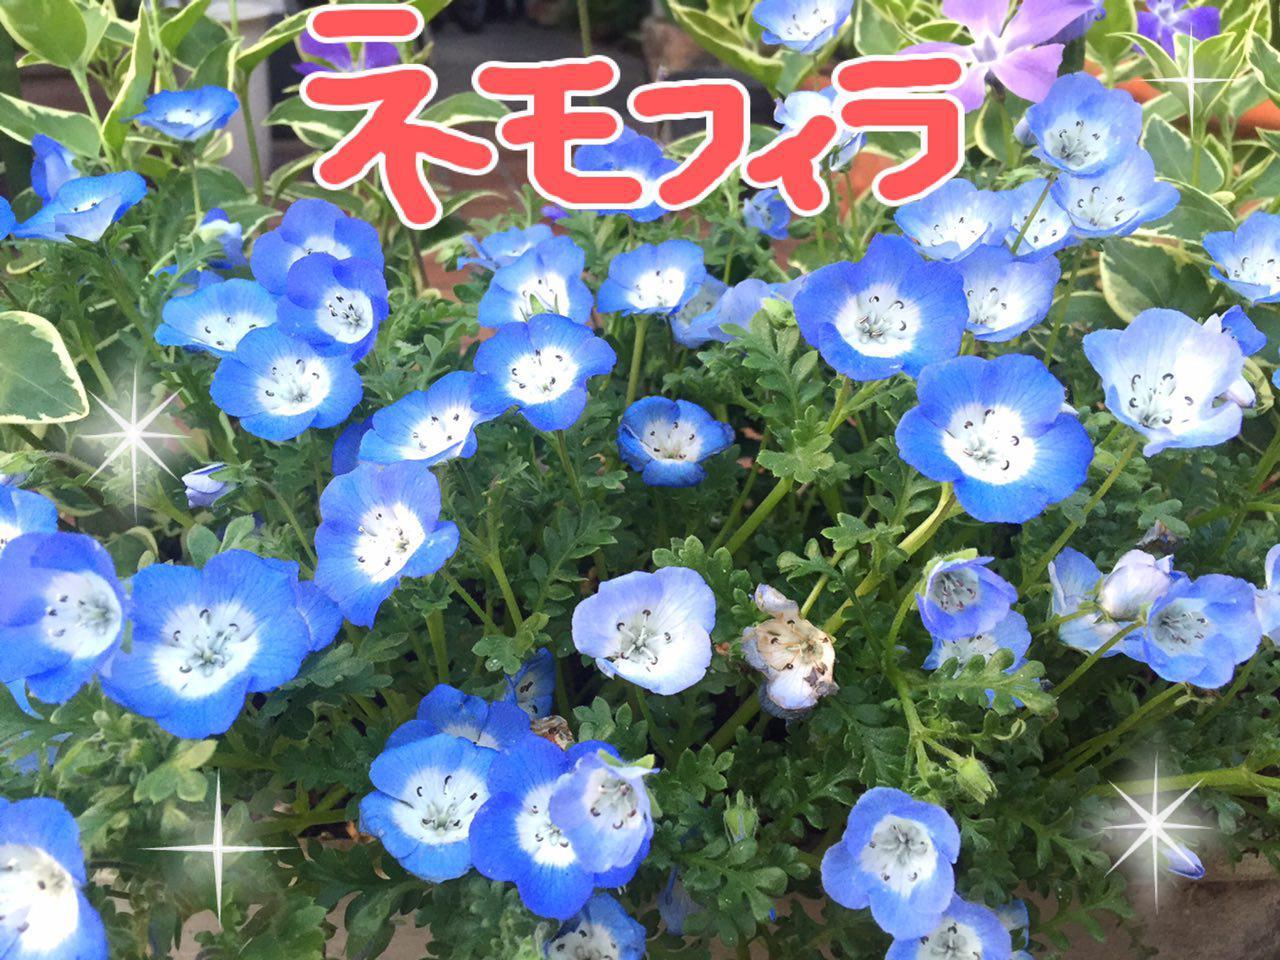 photo_2017-04-15_22-59-23.jpg